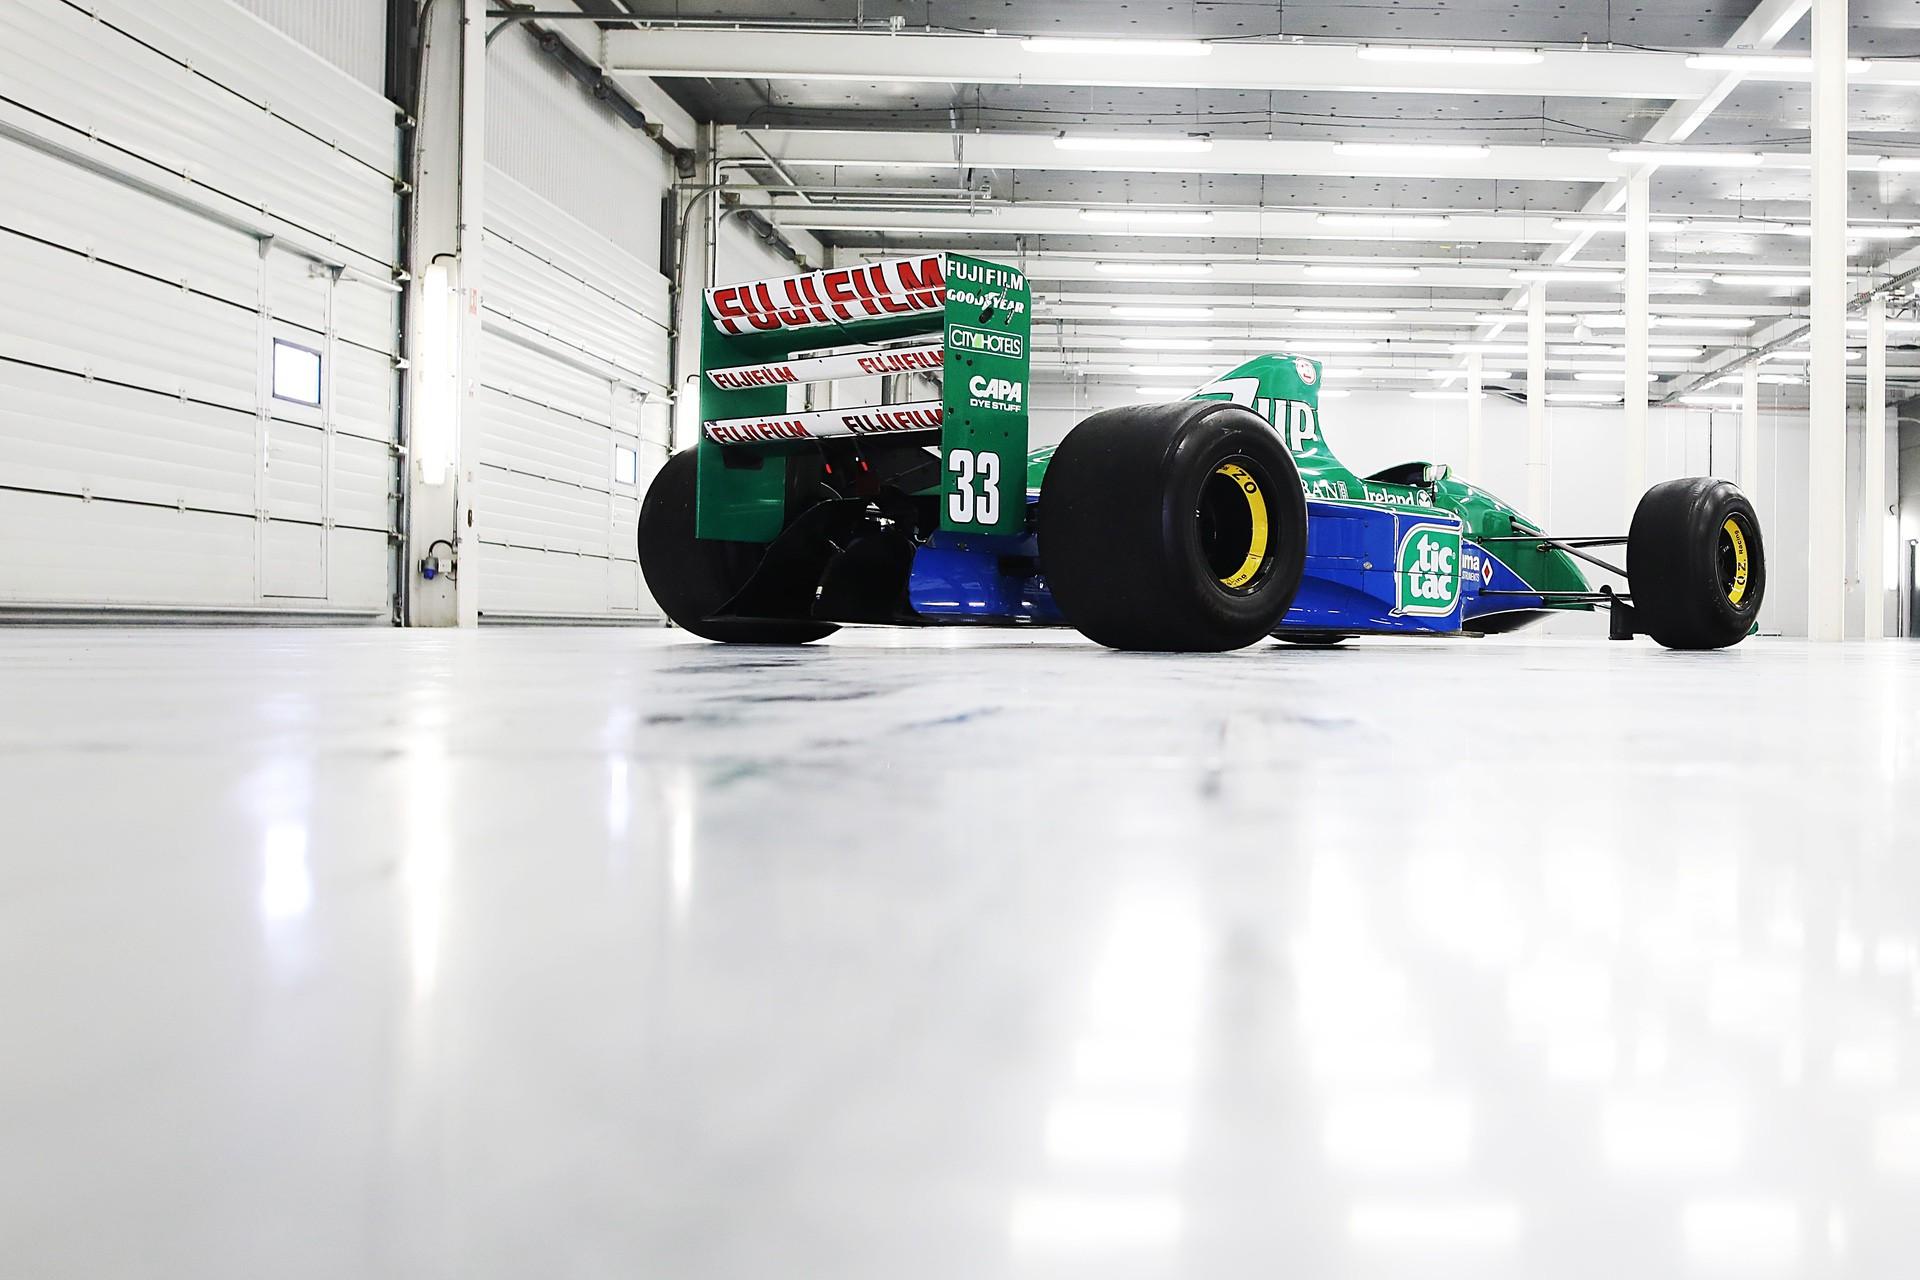 Michael_Schumacher_Jordan_F1_debut-0003